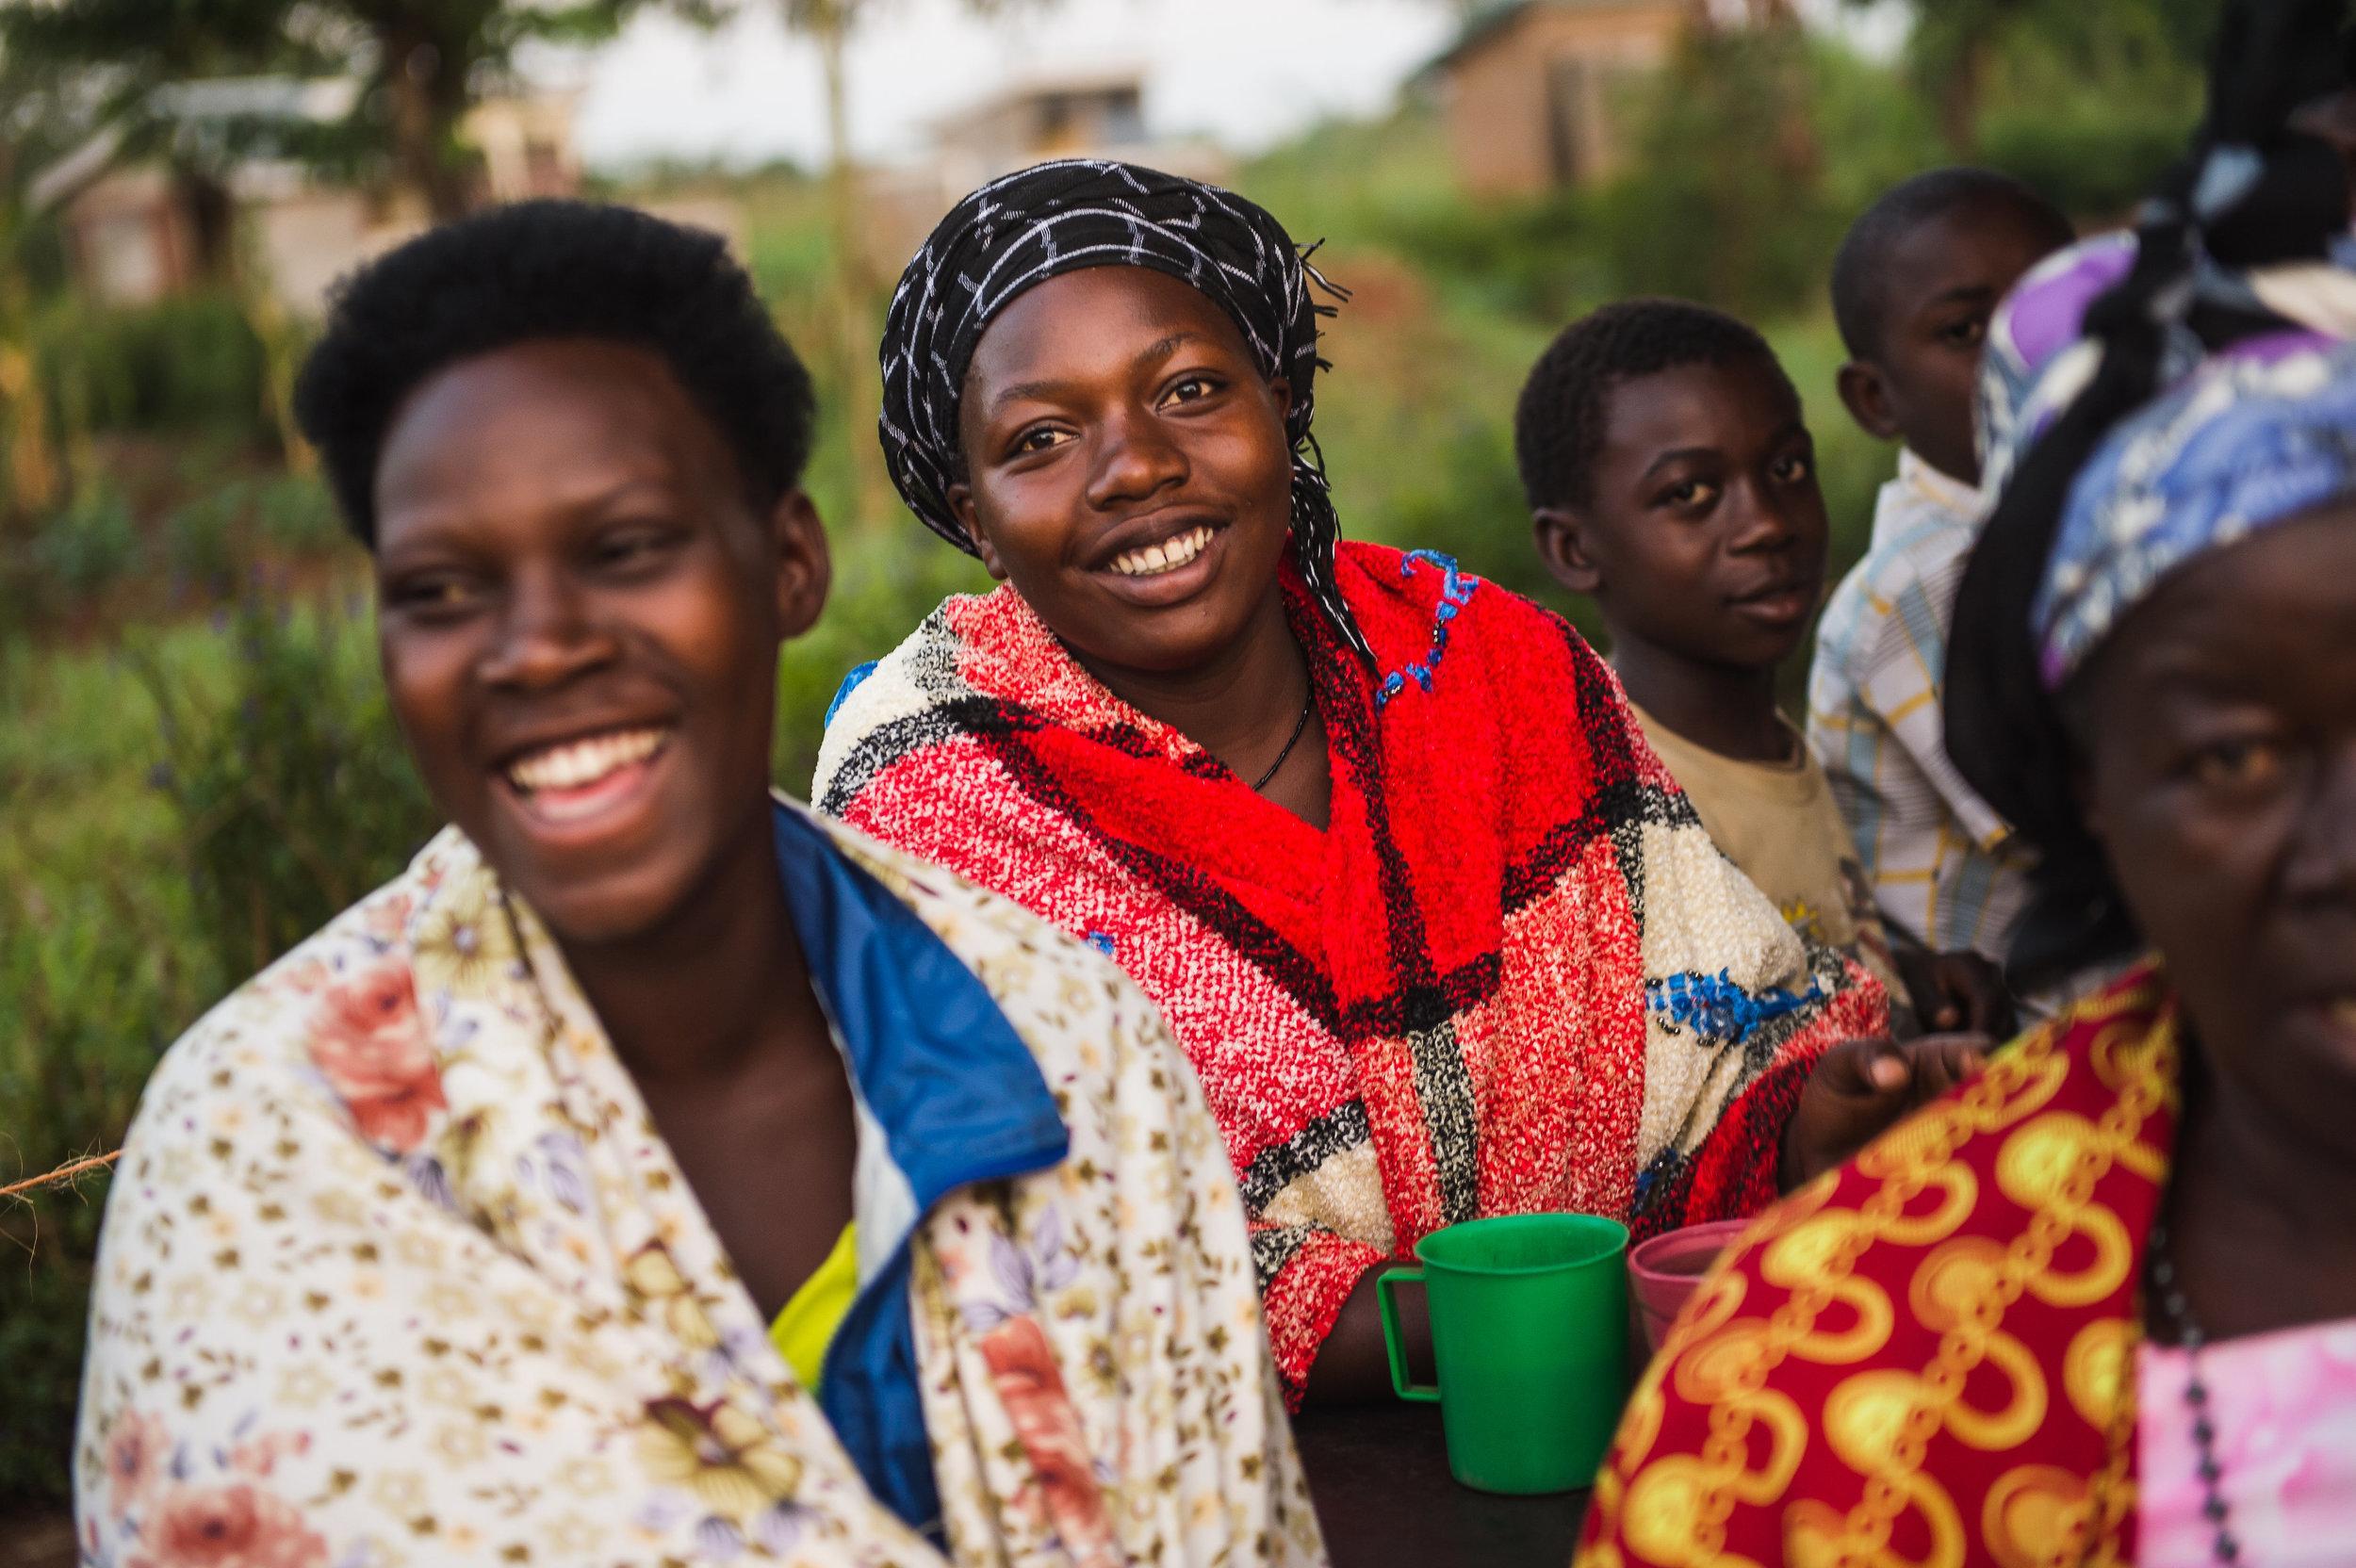 2014-Uganda-Paul-Kim-6008.jpg